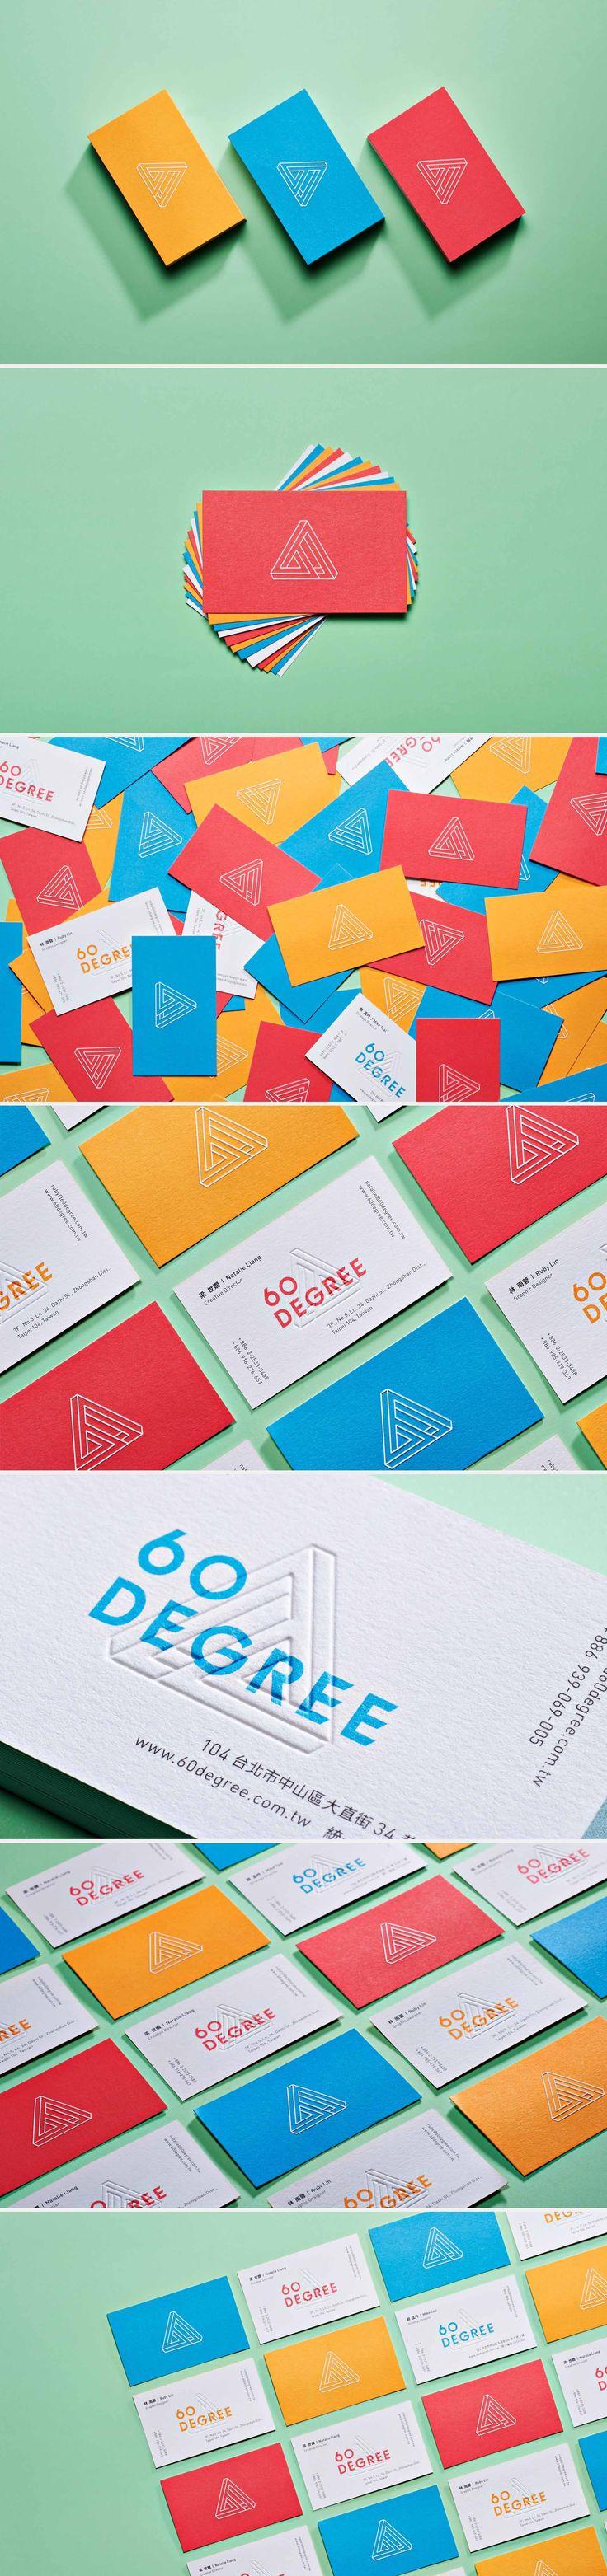 Branding Design Innotop 60 Degree Branding